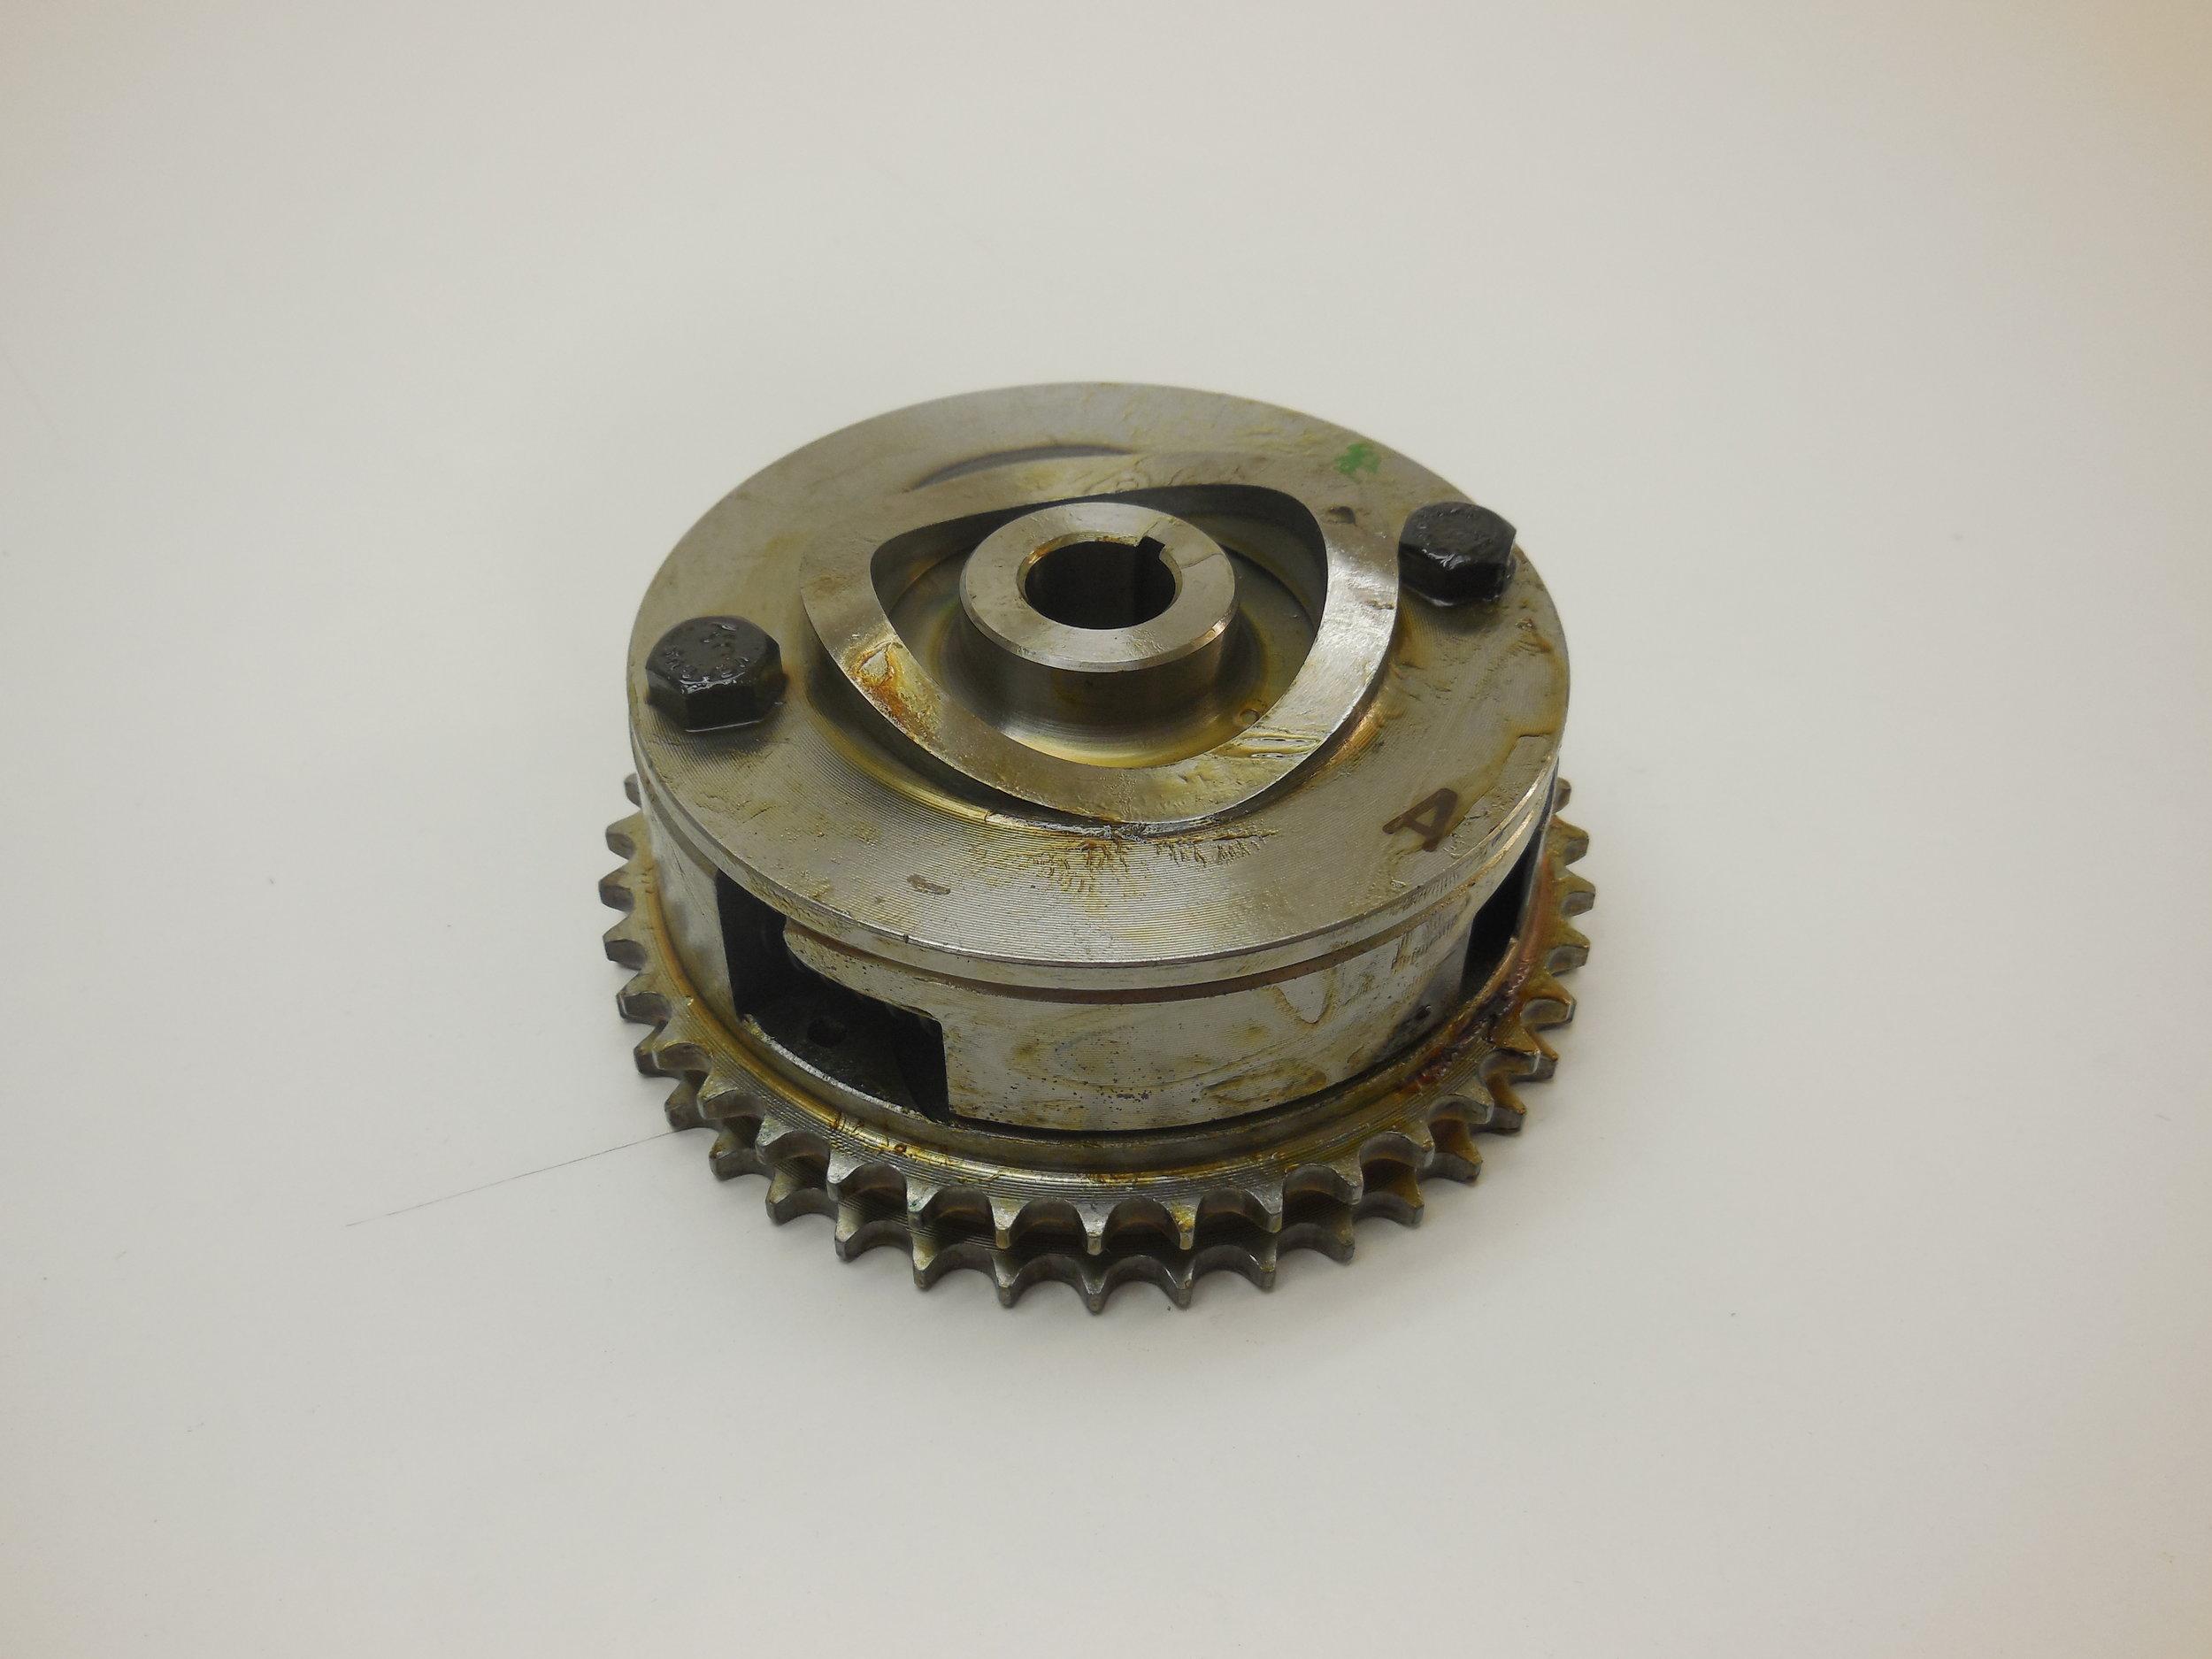 Injetion timing device Mb nr: 615 070 04 45   price: 4100 Sek